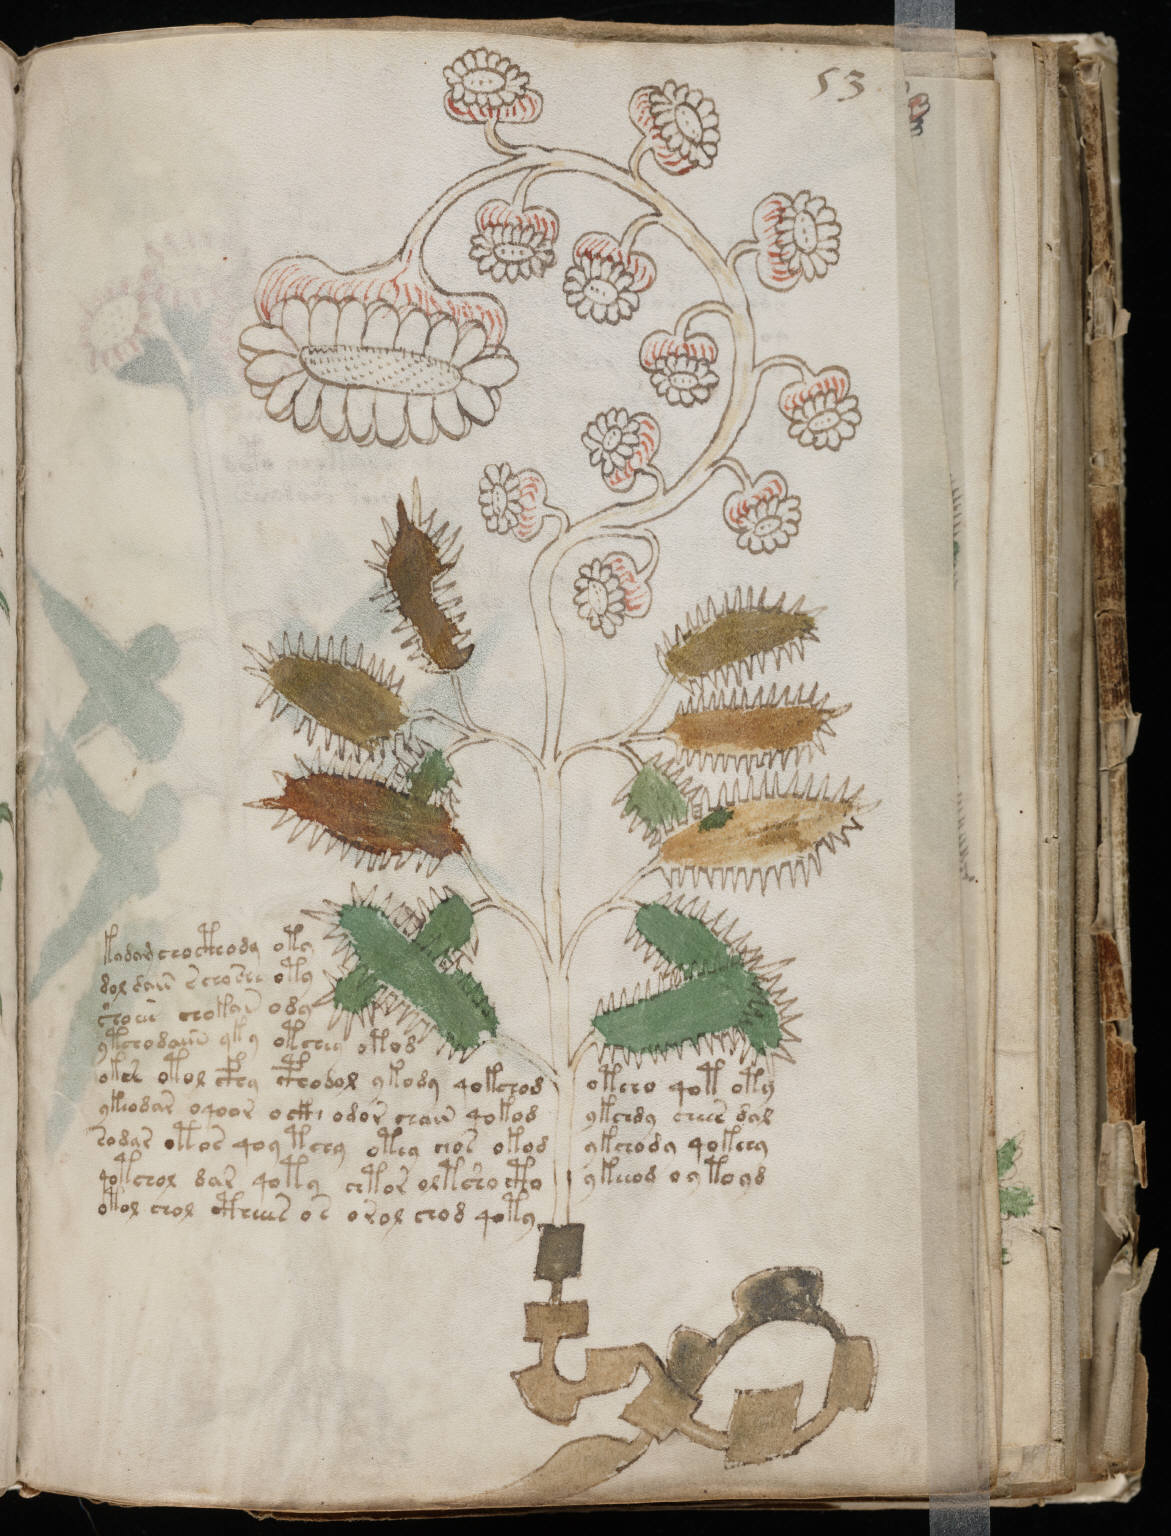 Voynich Manuscript %28105%29 ヴォイニッチ手稿(写本) どの言語にも属さない謎の文字!